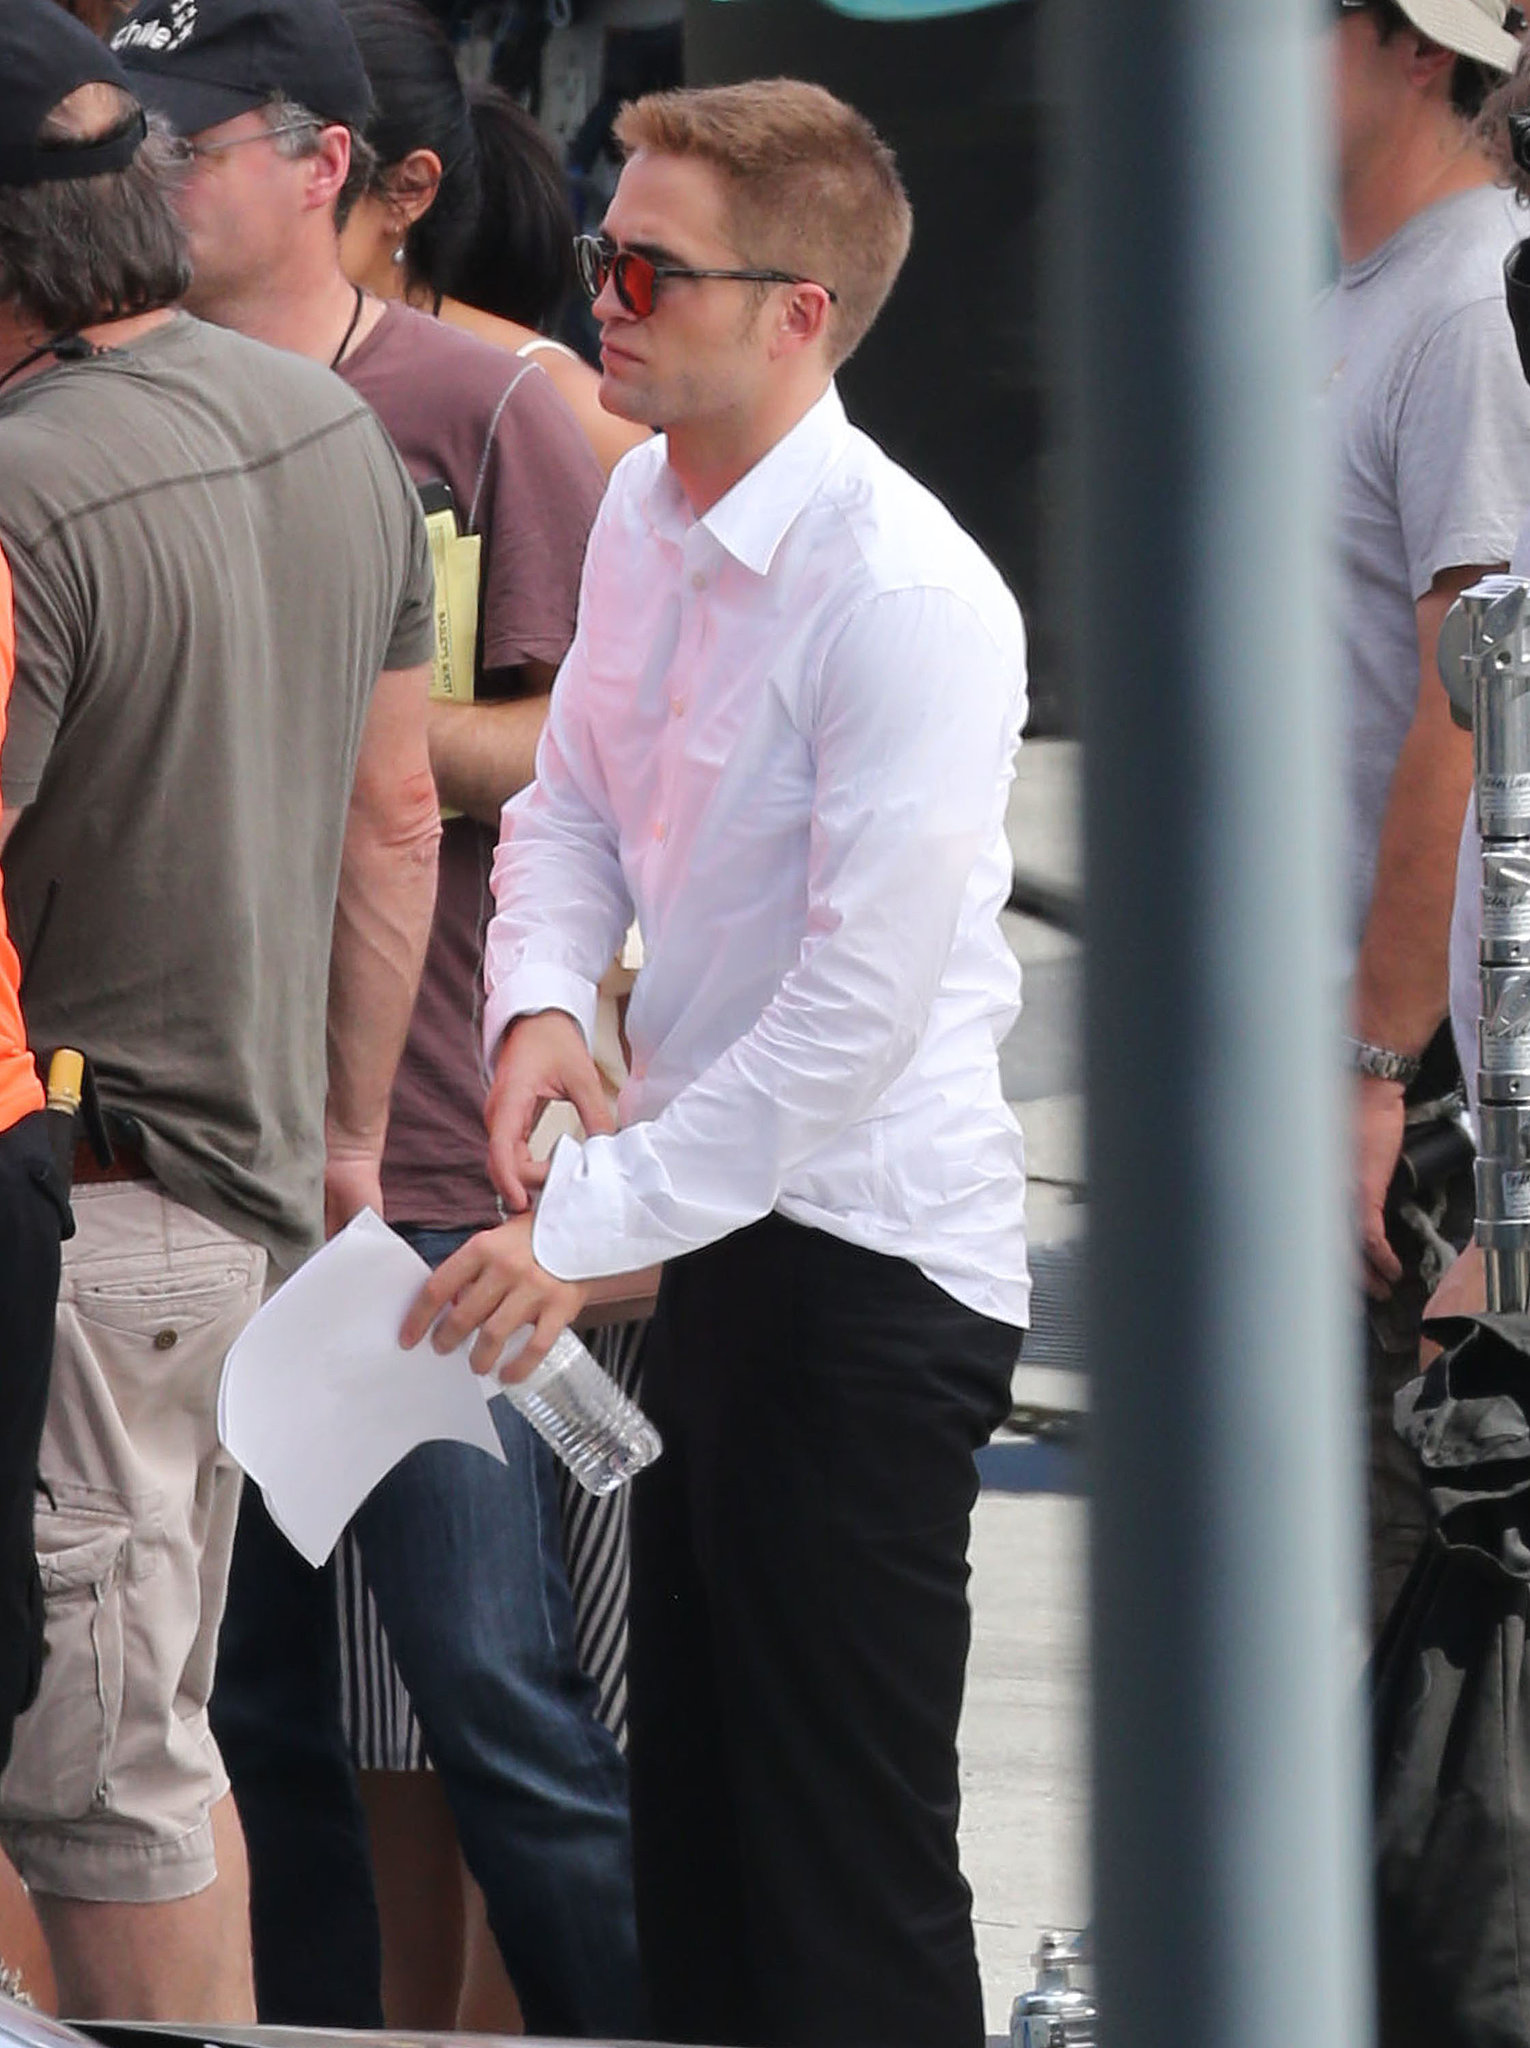 Robert Pattinson's Sexy Kiss With Mia Wasikowska May Be Too Hot to Handle